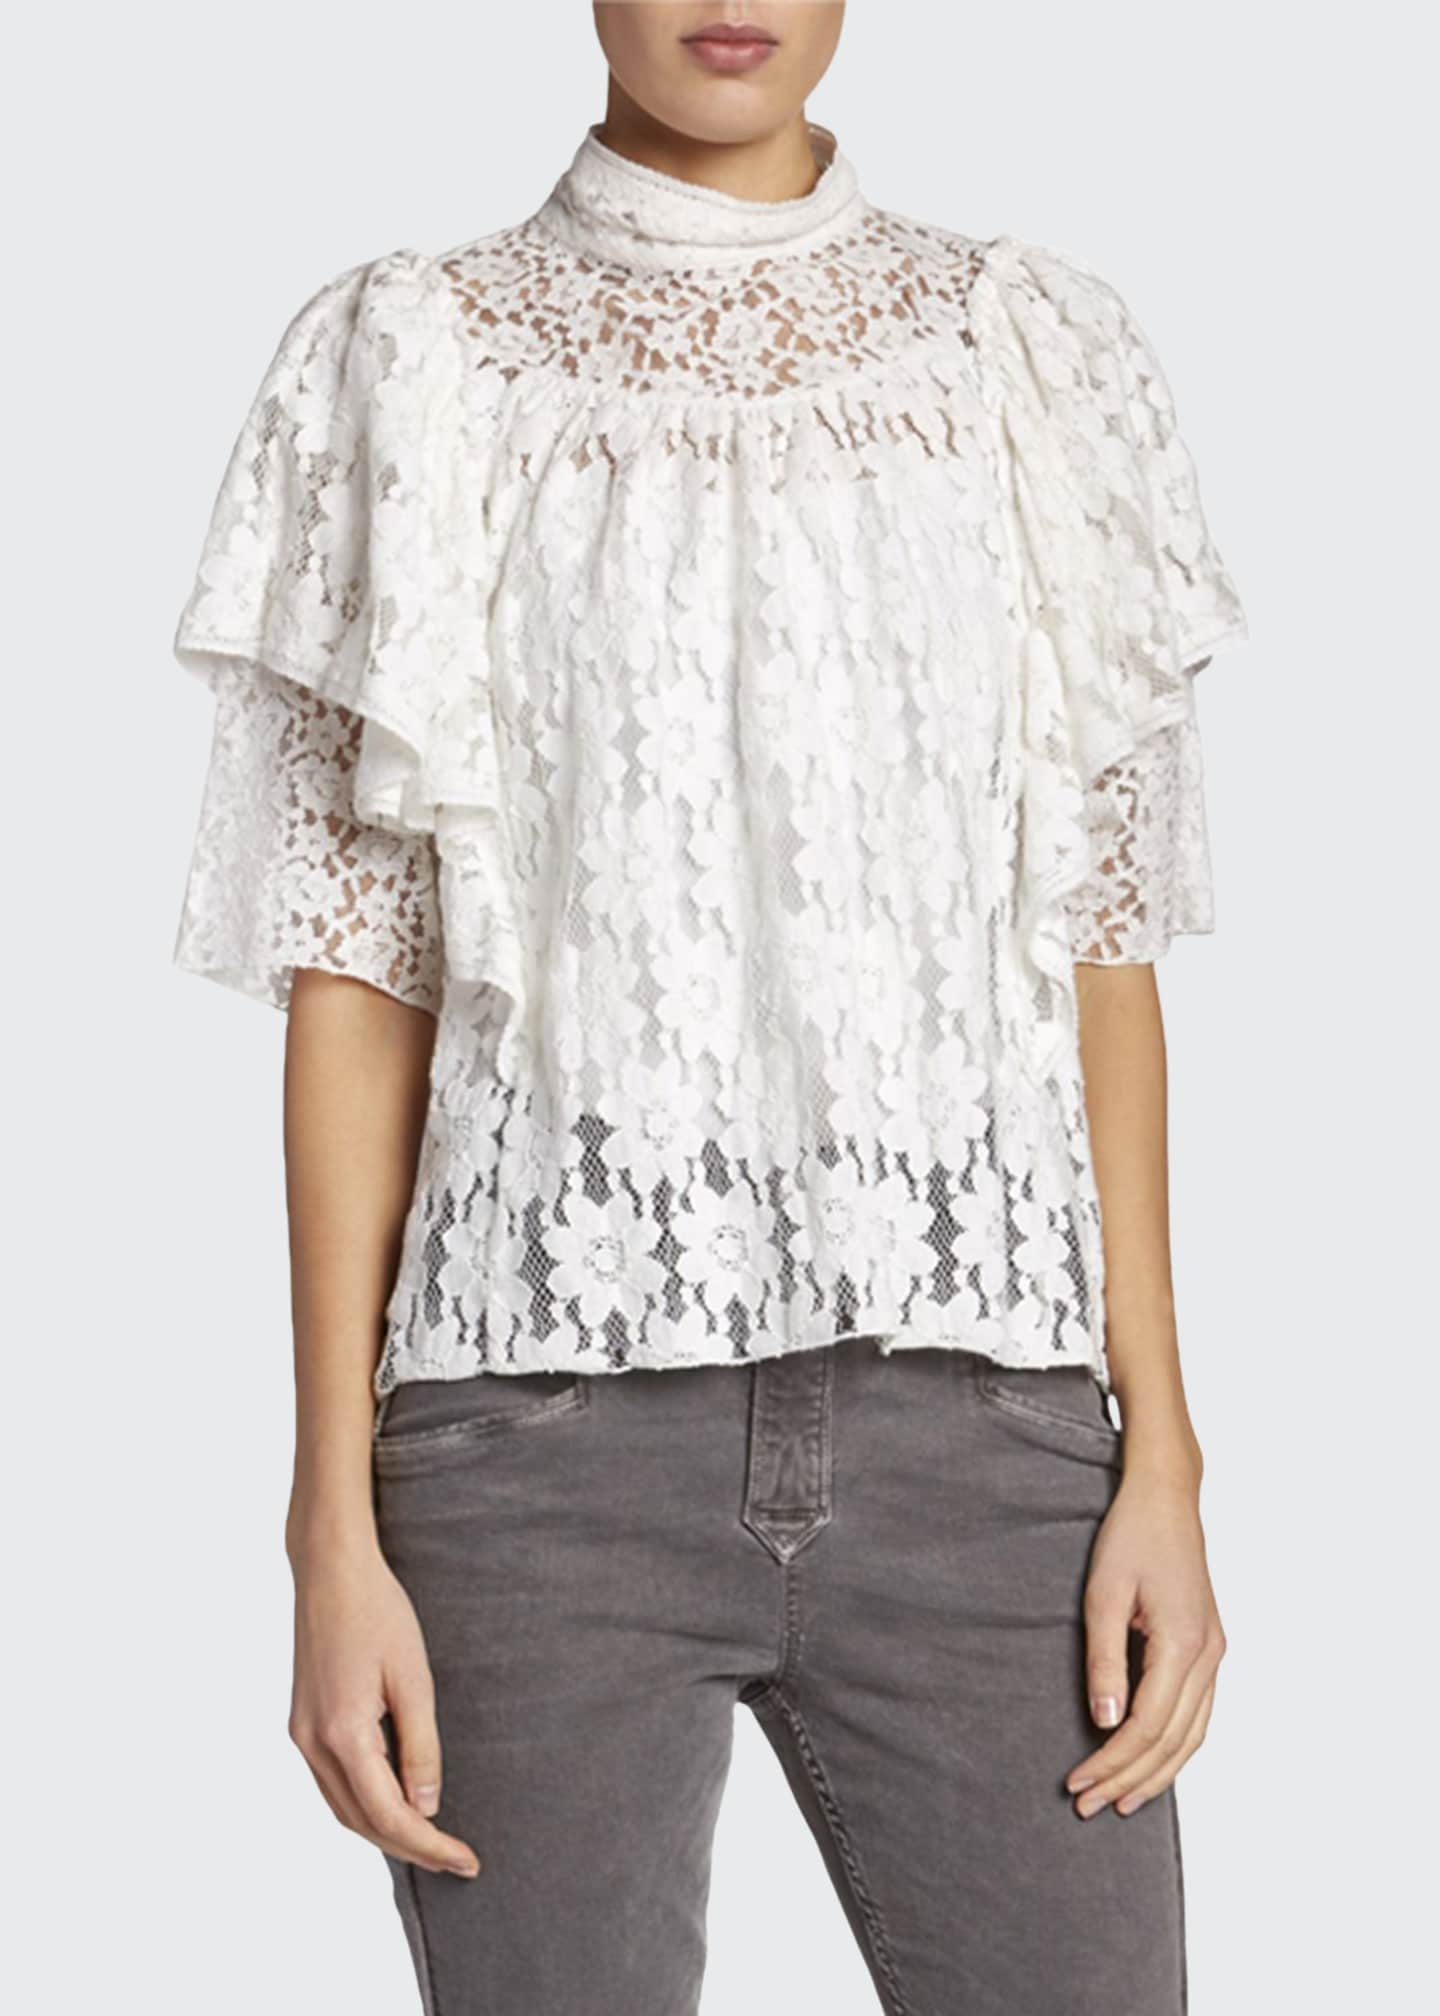 Etoile Isabel Marant Vetea High-Neck Tiered Lace Ruffle